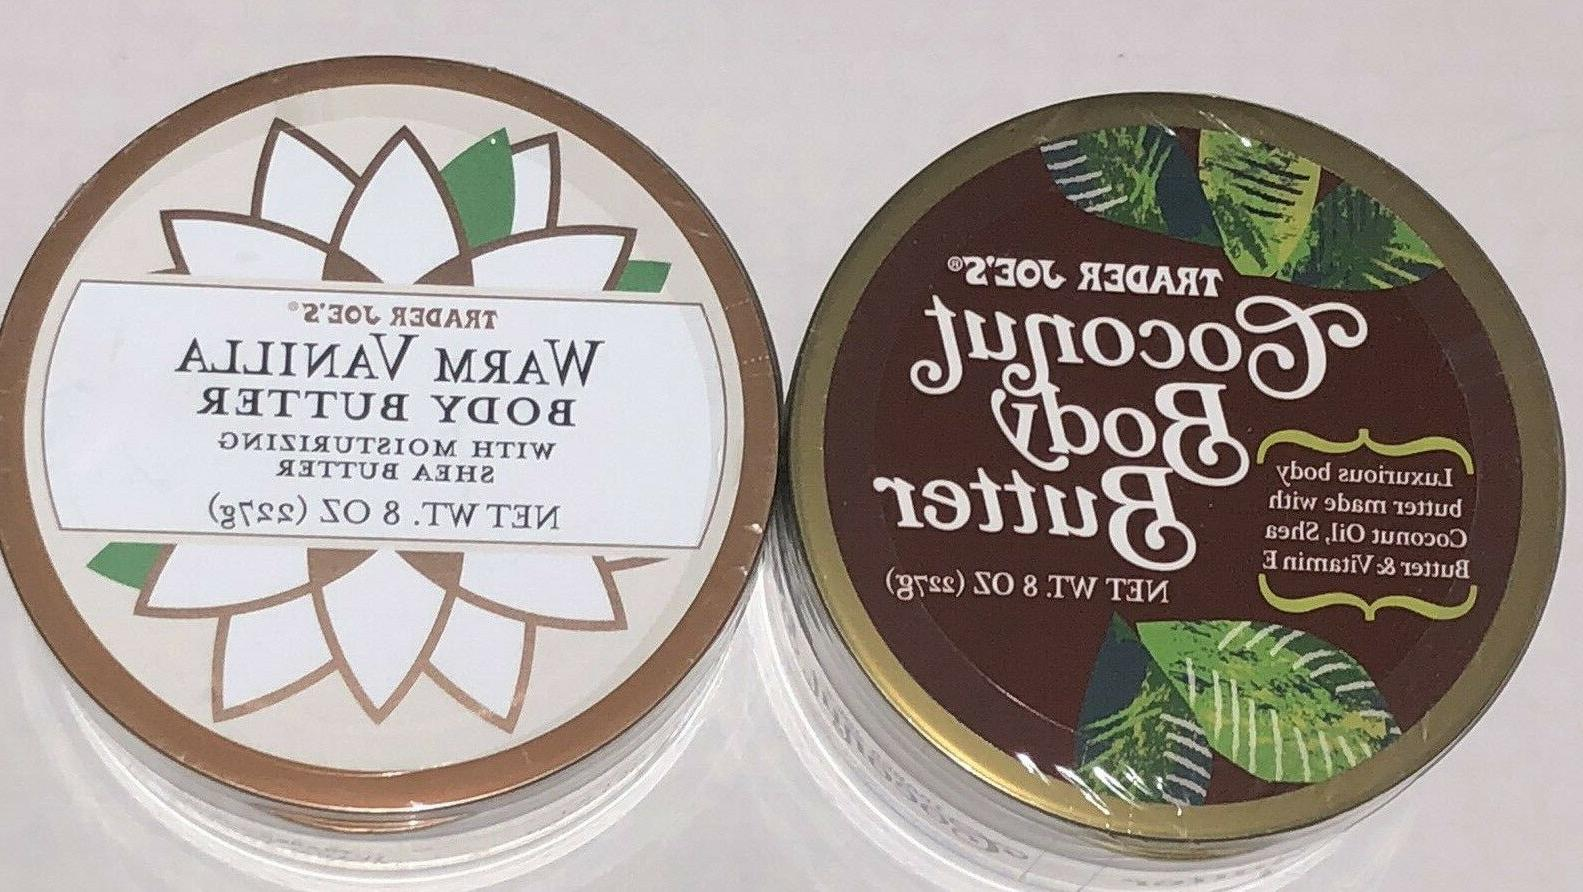 2x Trader Joe's @ Coconut Body Butter & Warm Vanilla@ 2x 227